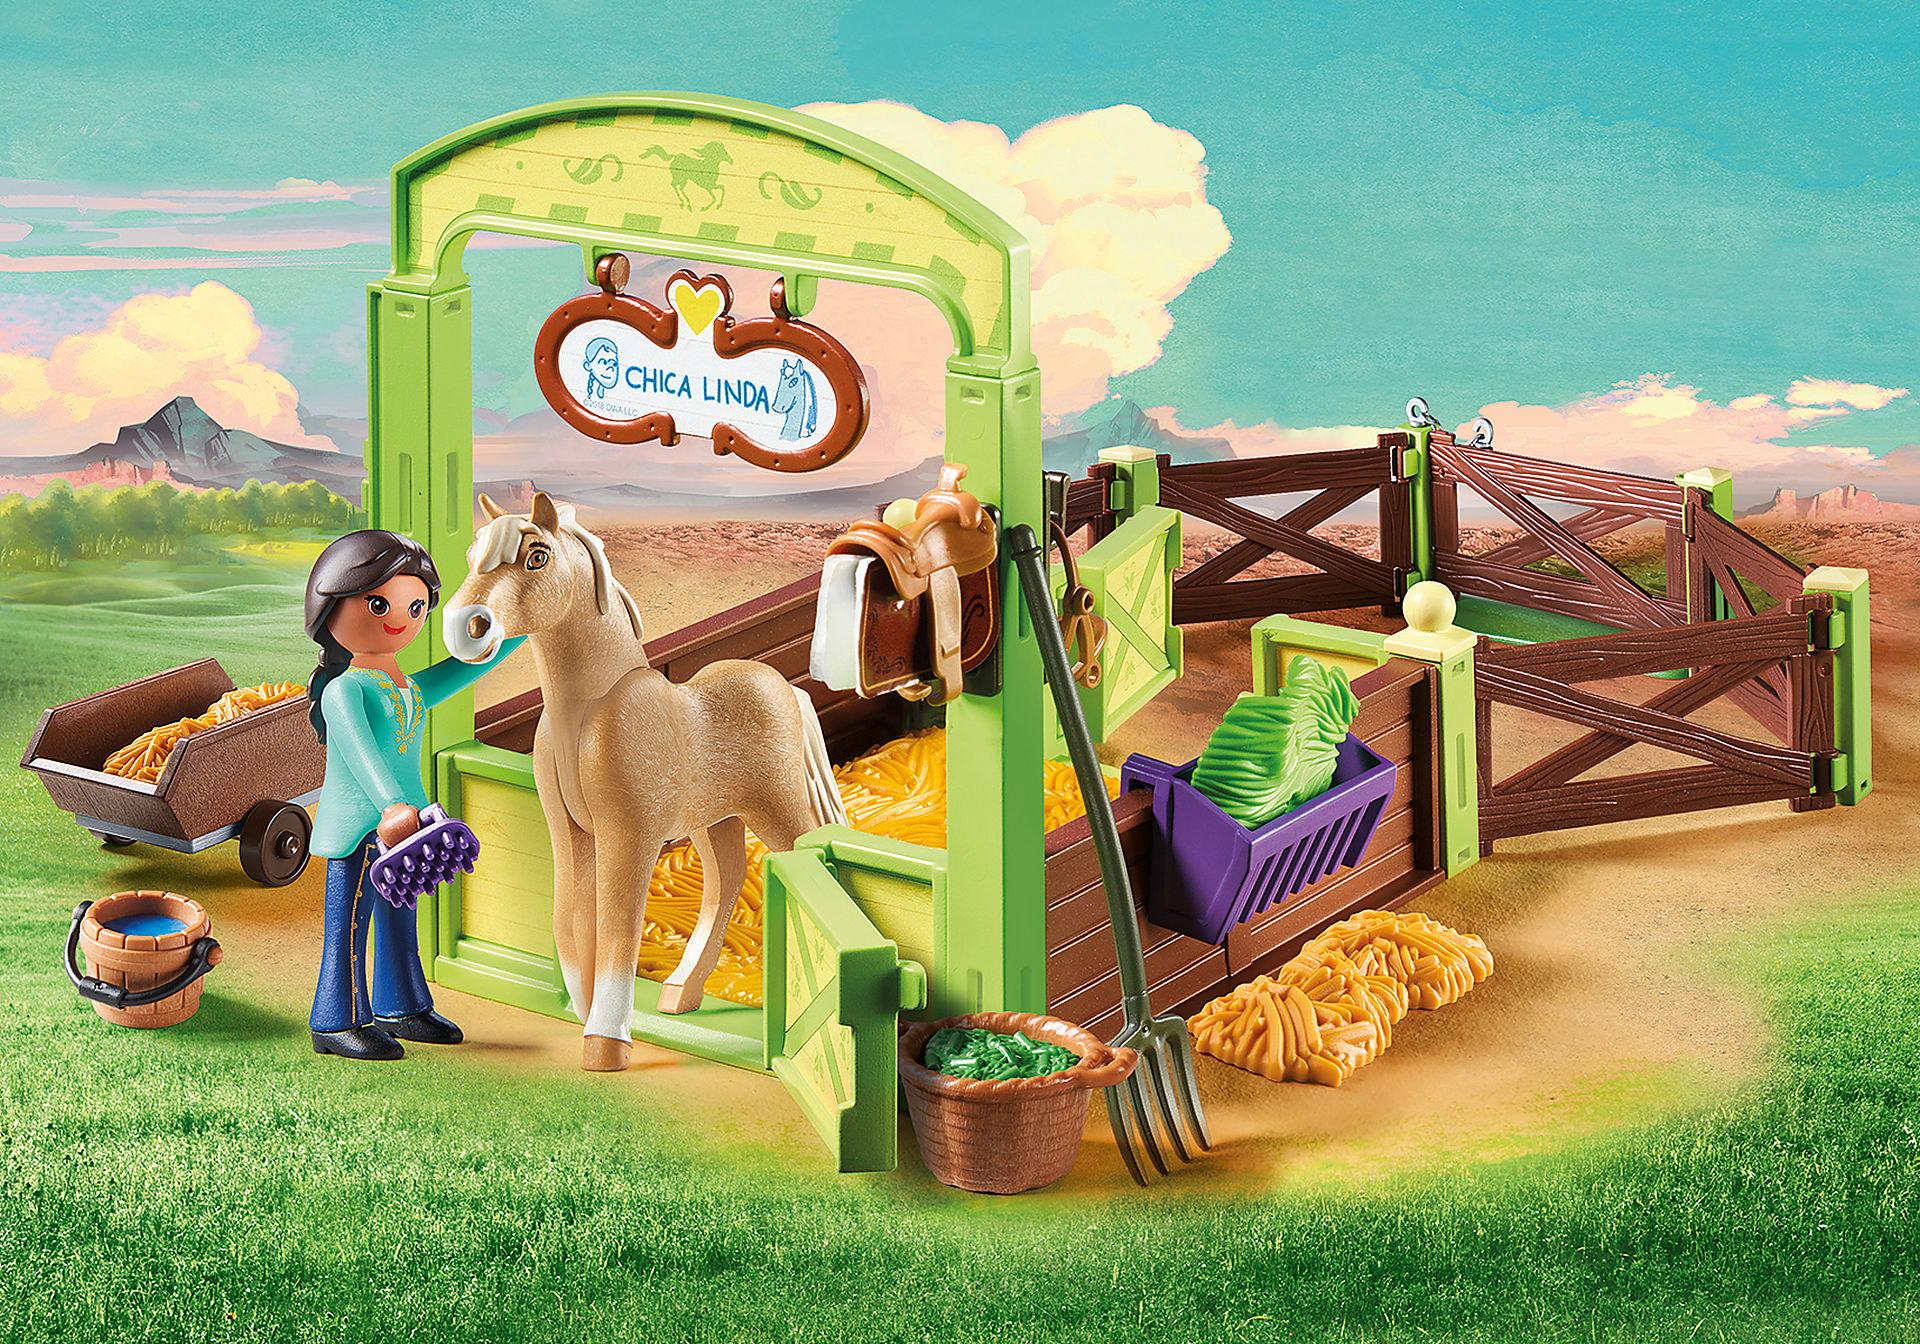 http://media.playmobil.com/i/playmobil/9479_product_detail/Apo et Chica Linda avec box